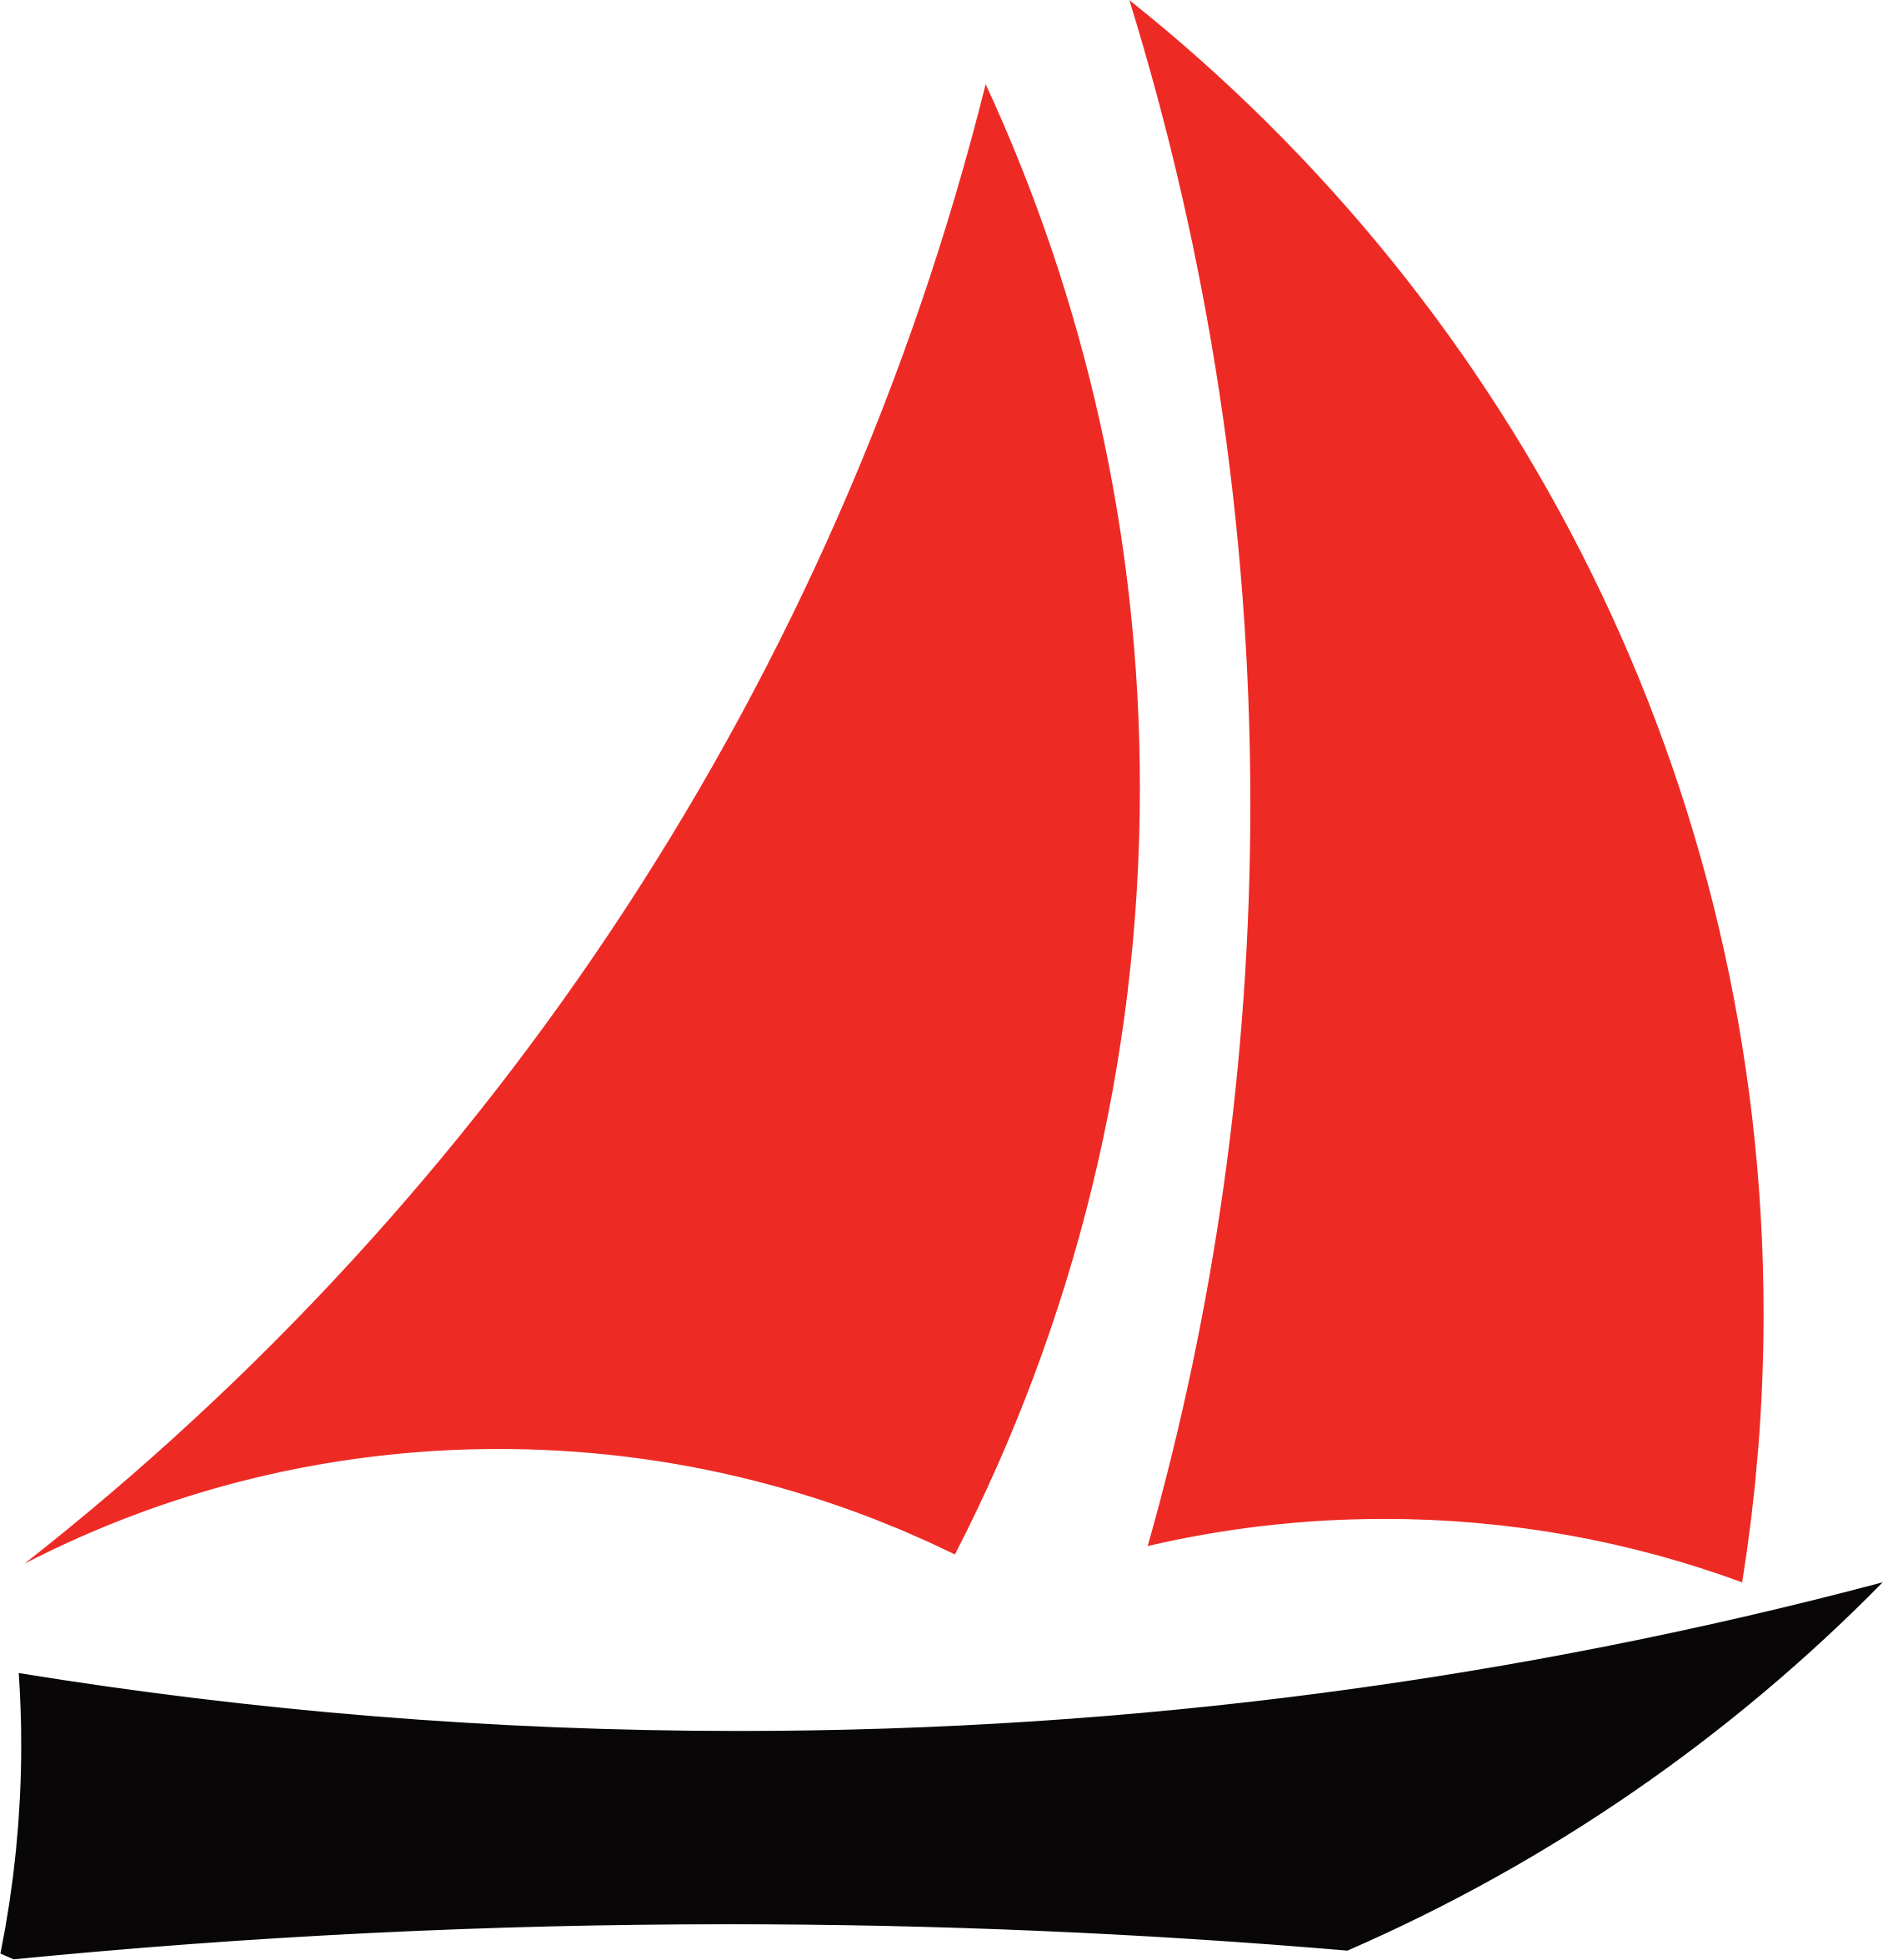 Sailboat clipart dinghy #13